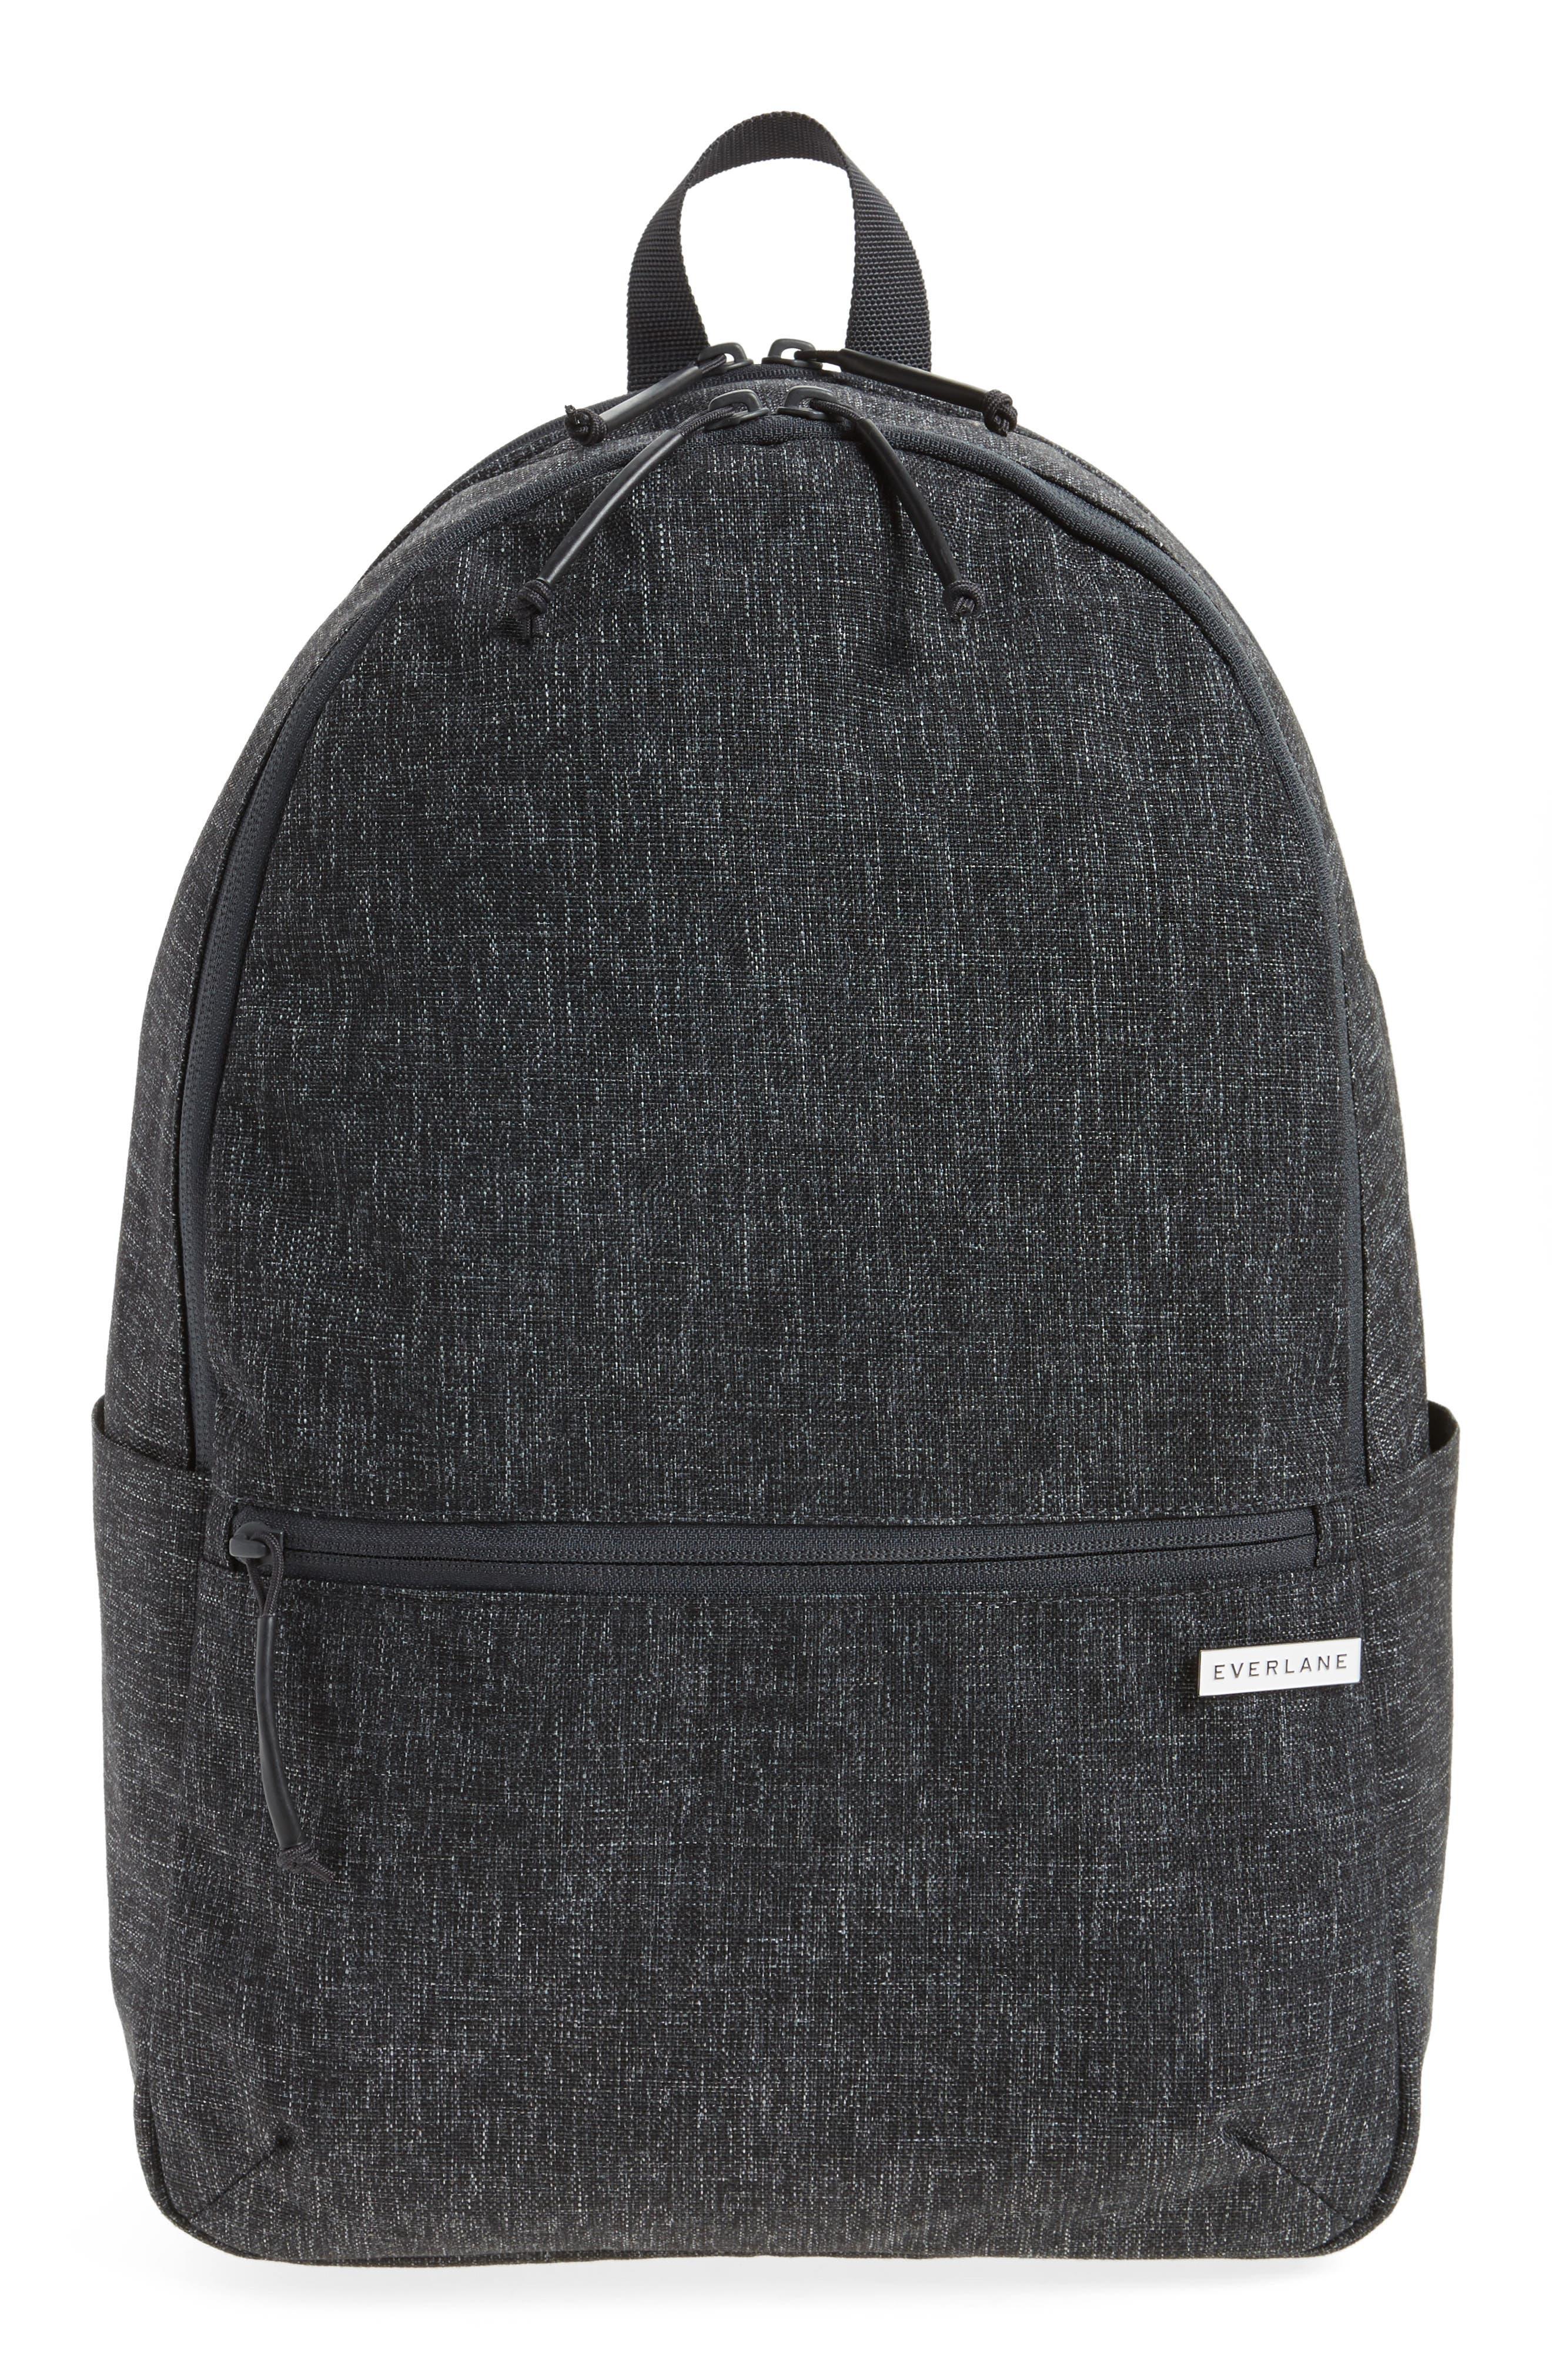 Everlane The Large Street Nylon Zip Backpack